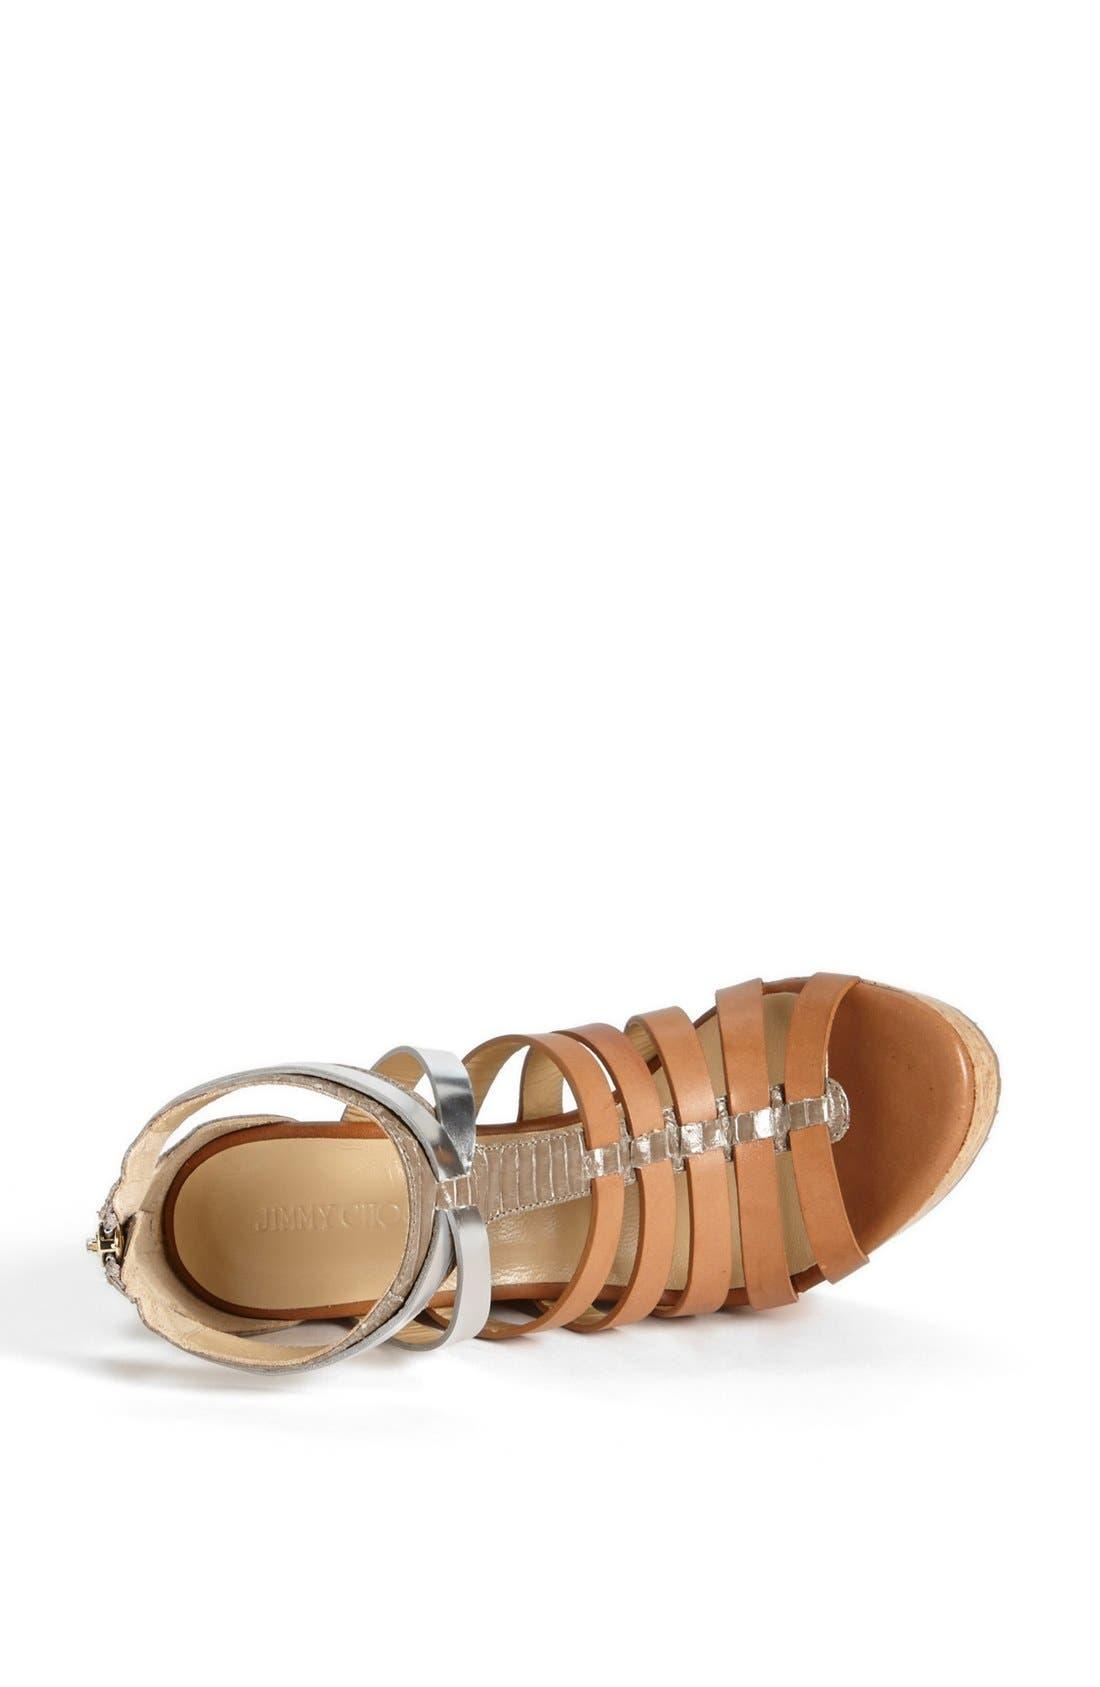 Alternate Image 3  - Jimmy Choo 'Pierce' Wedge Sandal